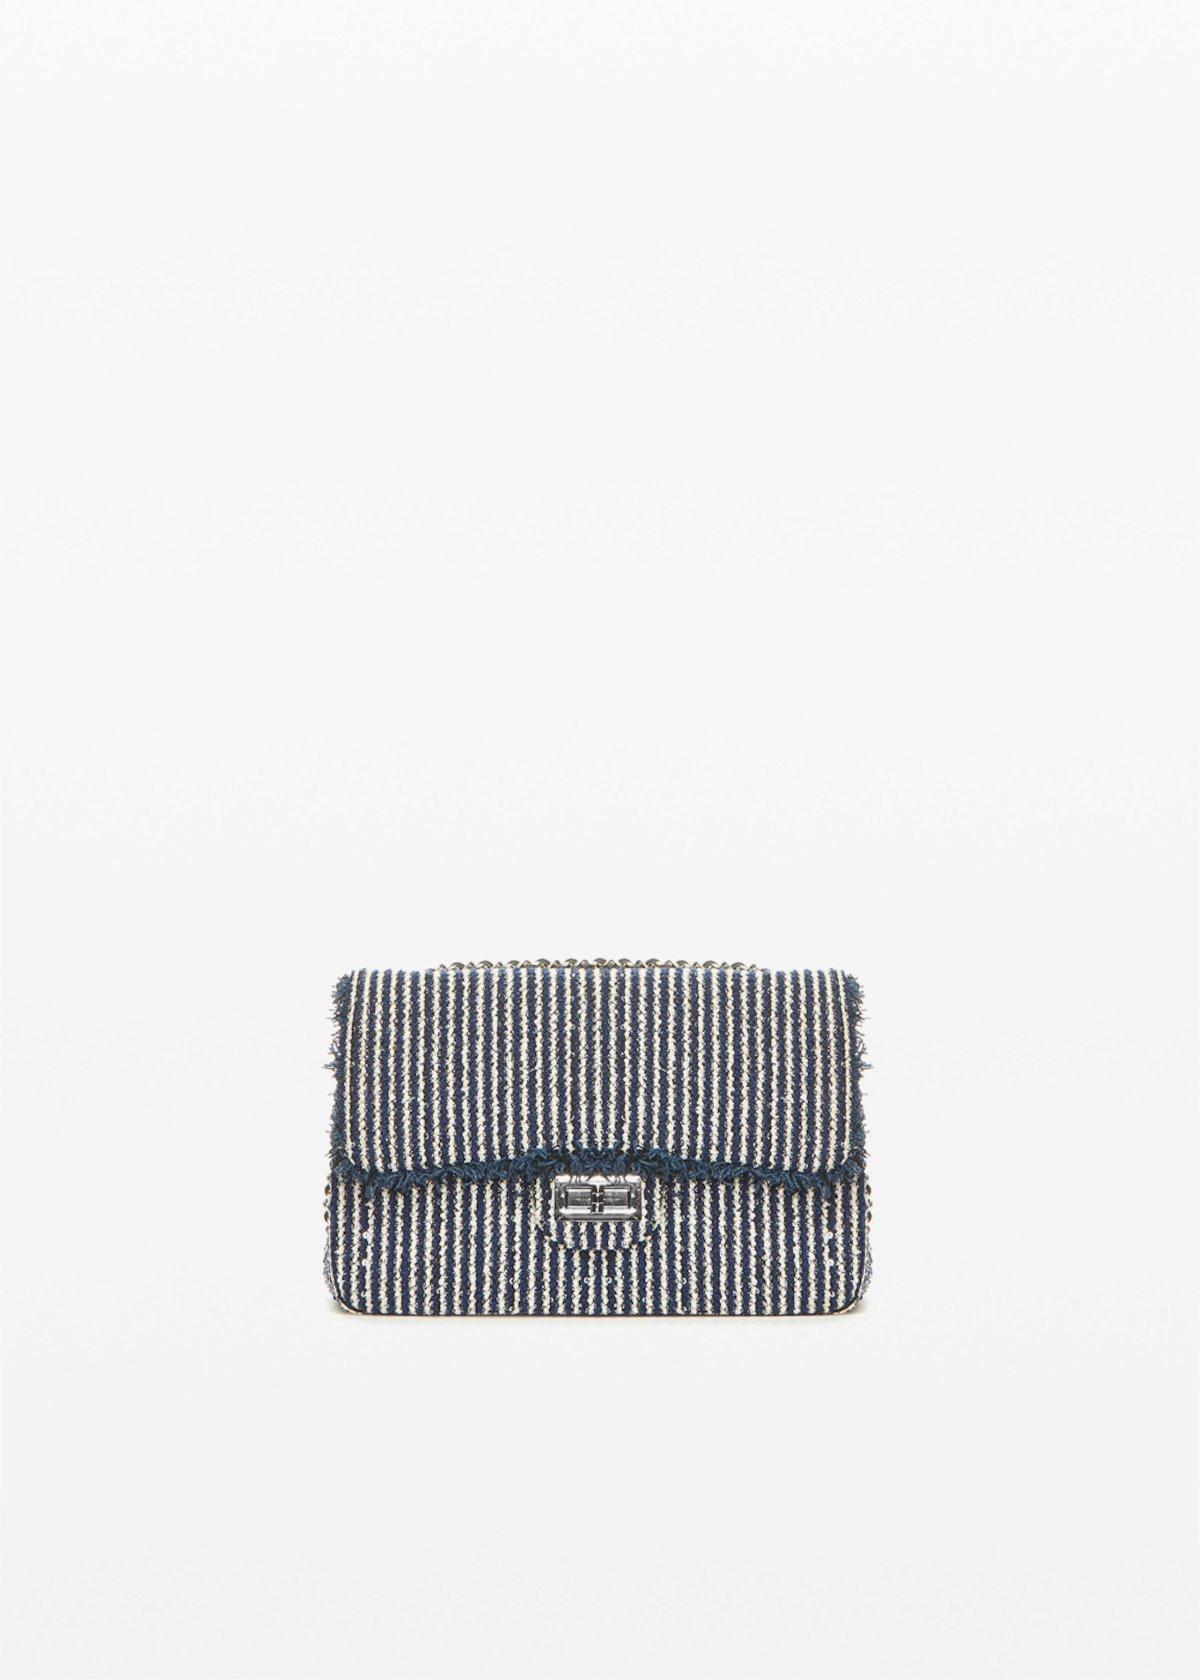 Giadastri semi rigid clutch - Blue / White Stripes - Woman